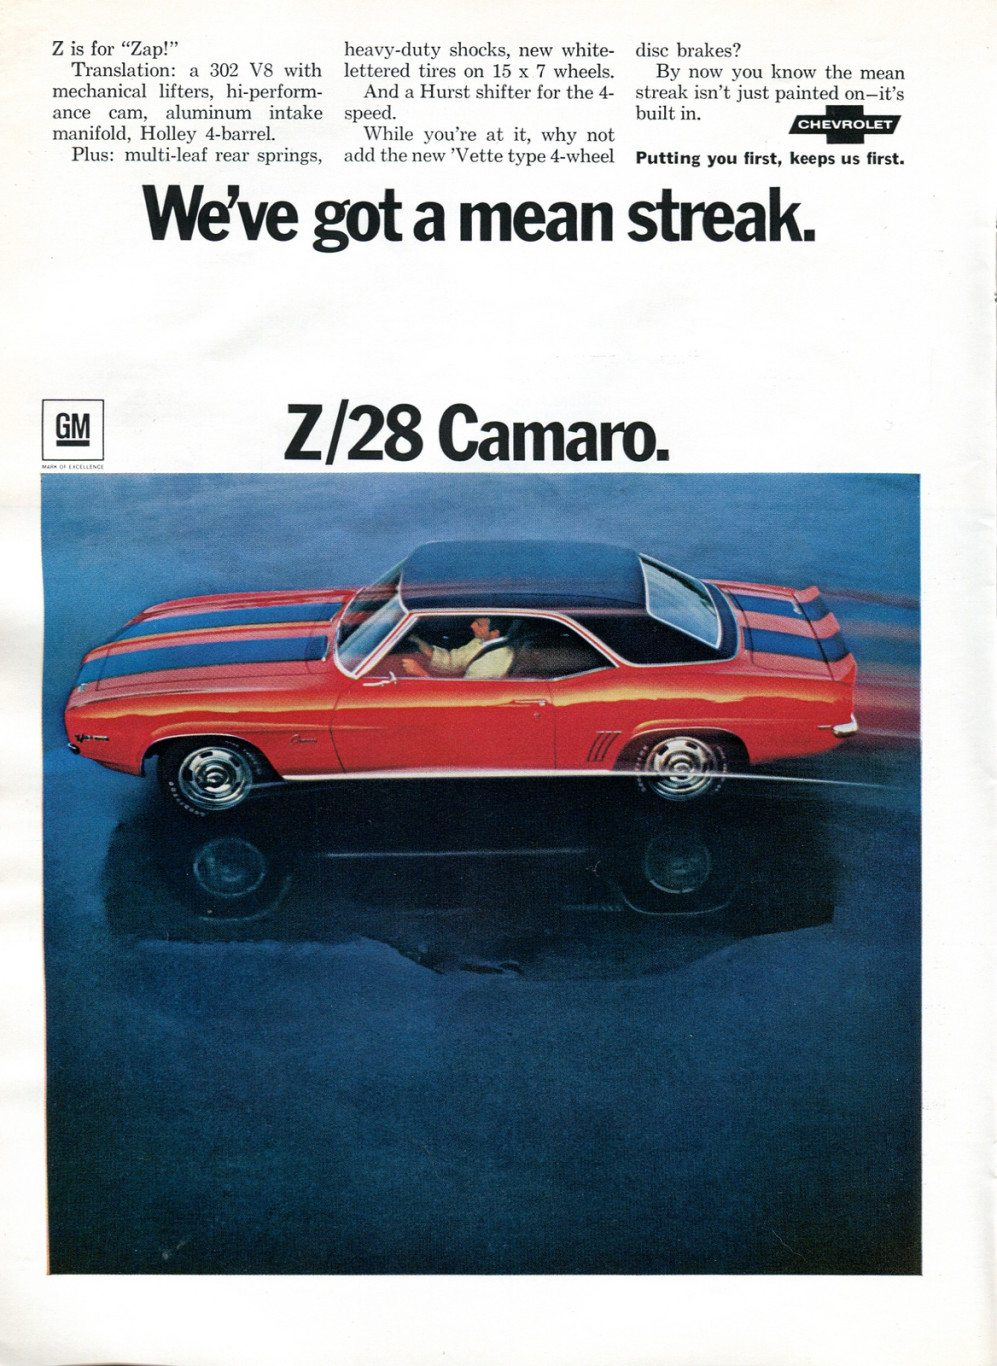 1969 Z28 Camaro Ad - We've Got a Mean Streak.